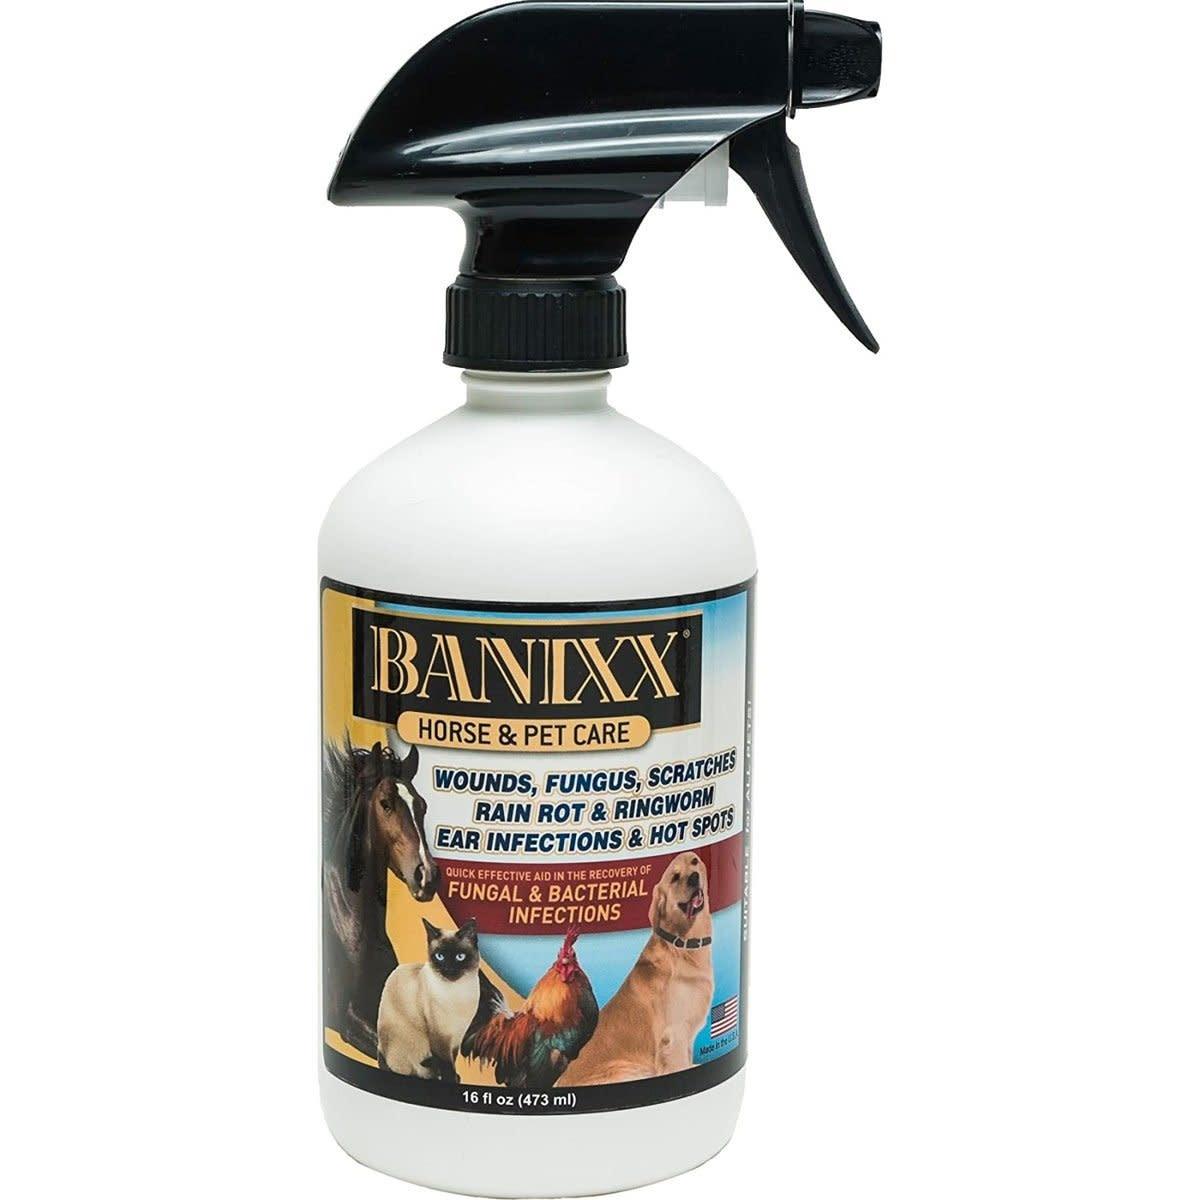 Banixx Wound Care 16 oz